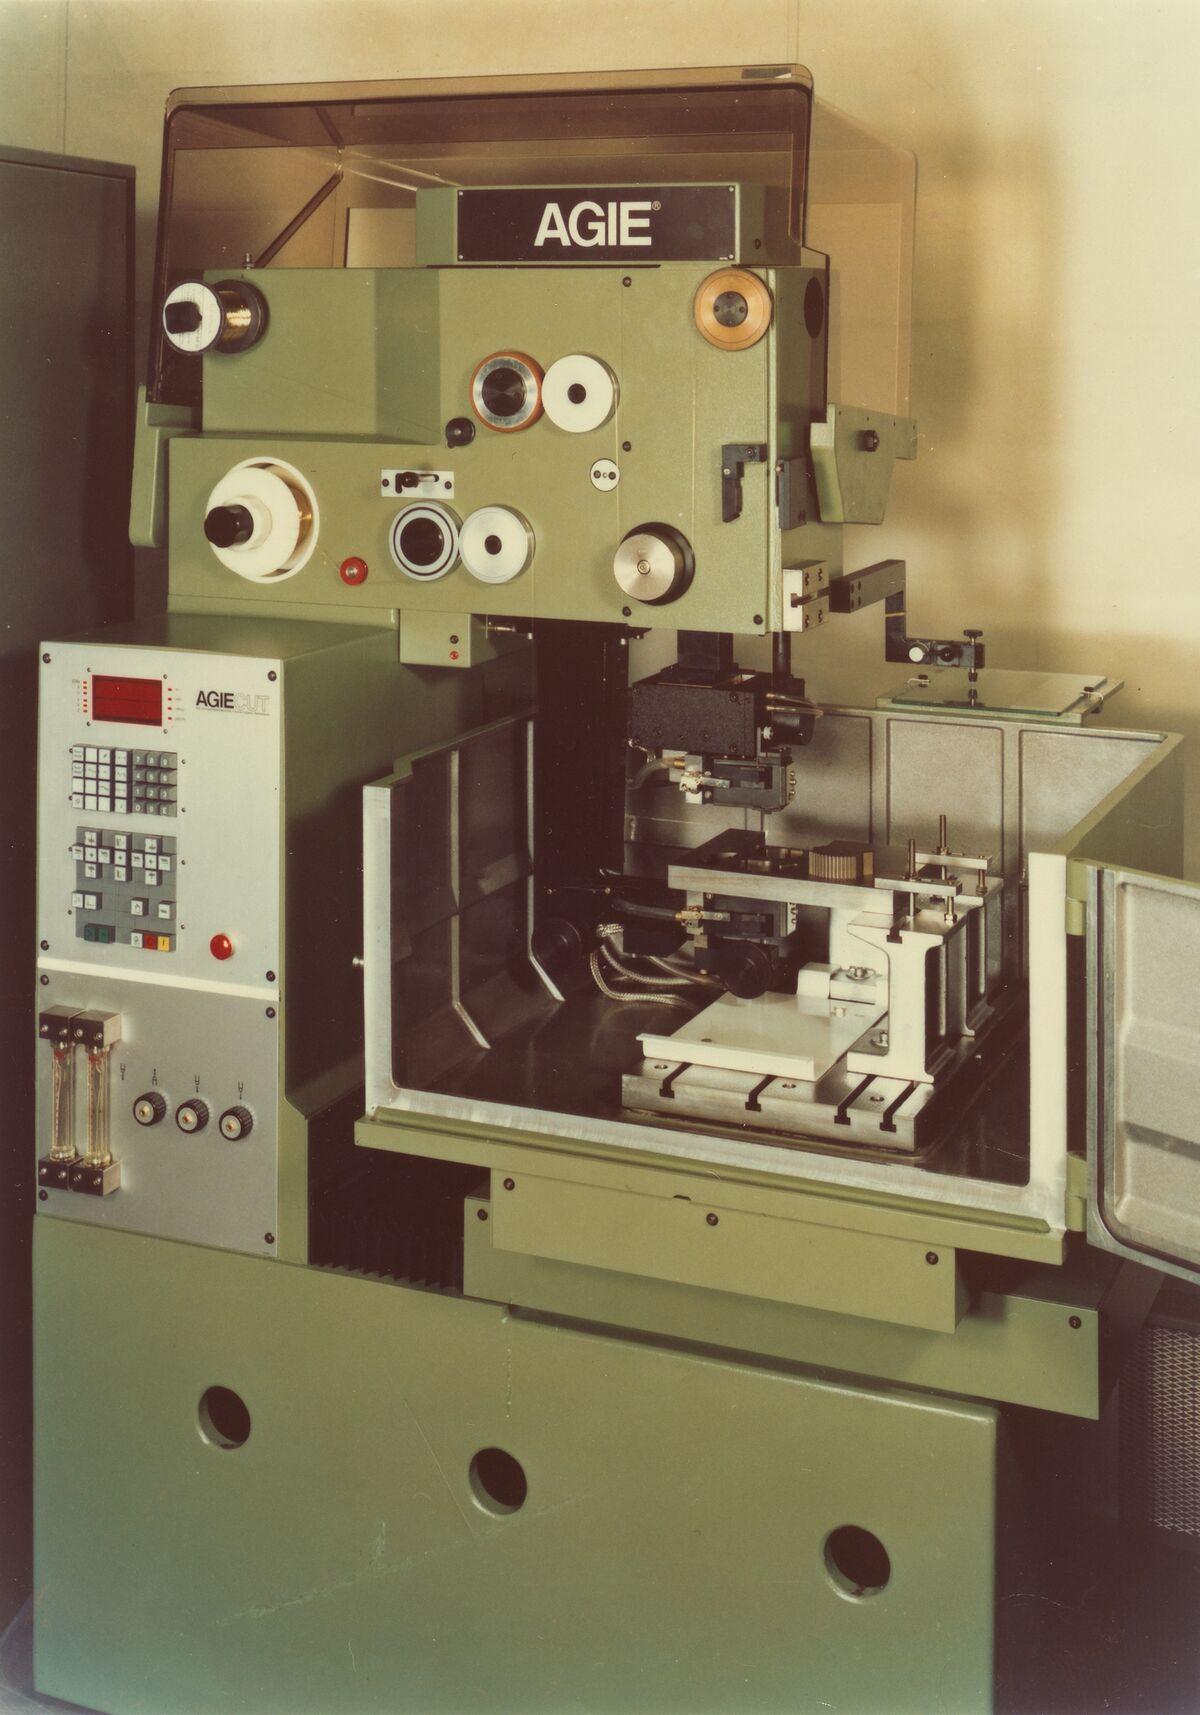 GFA 42/22159: AGIECUT DEM 250 mit Steuerung CNC 100